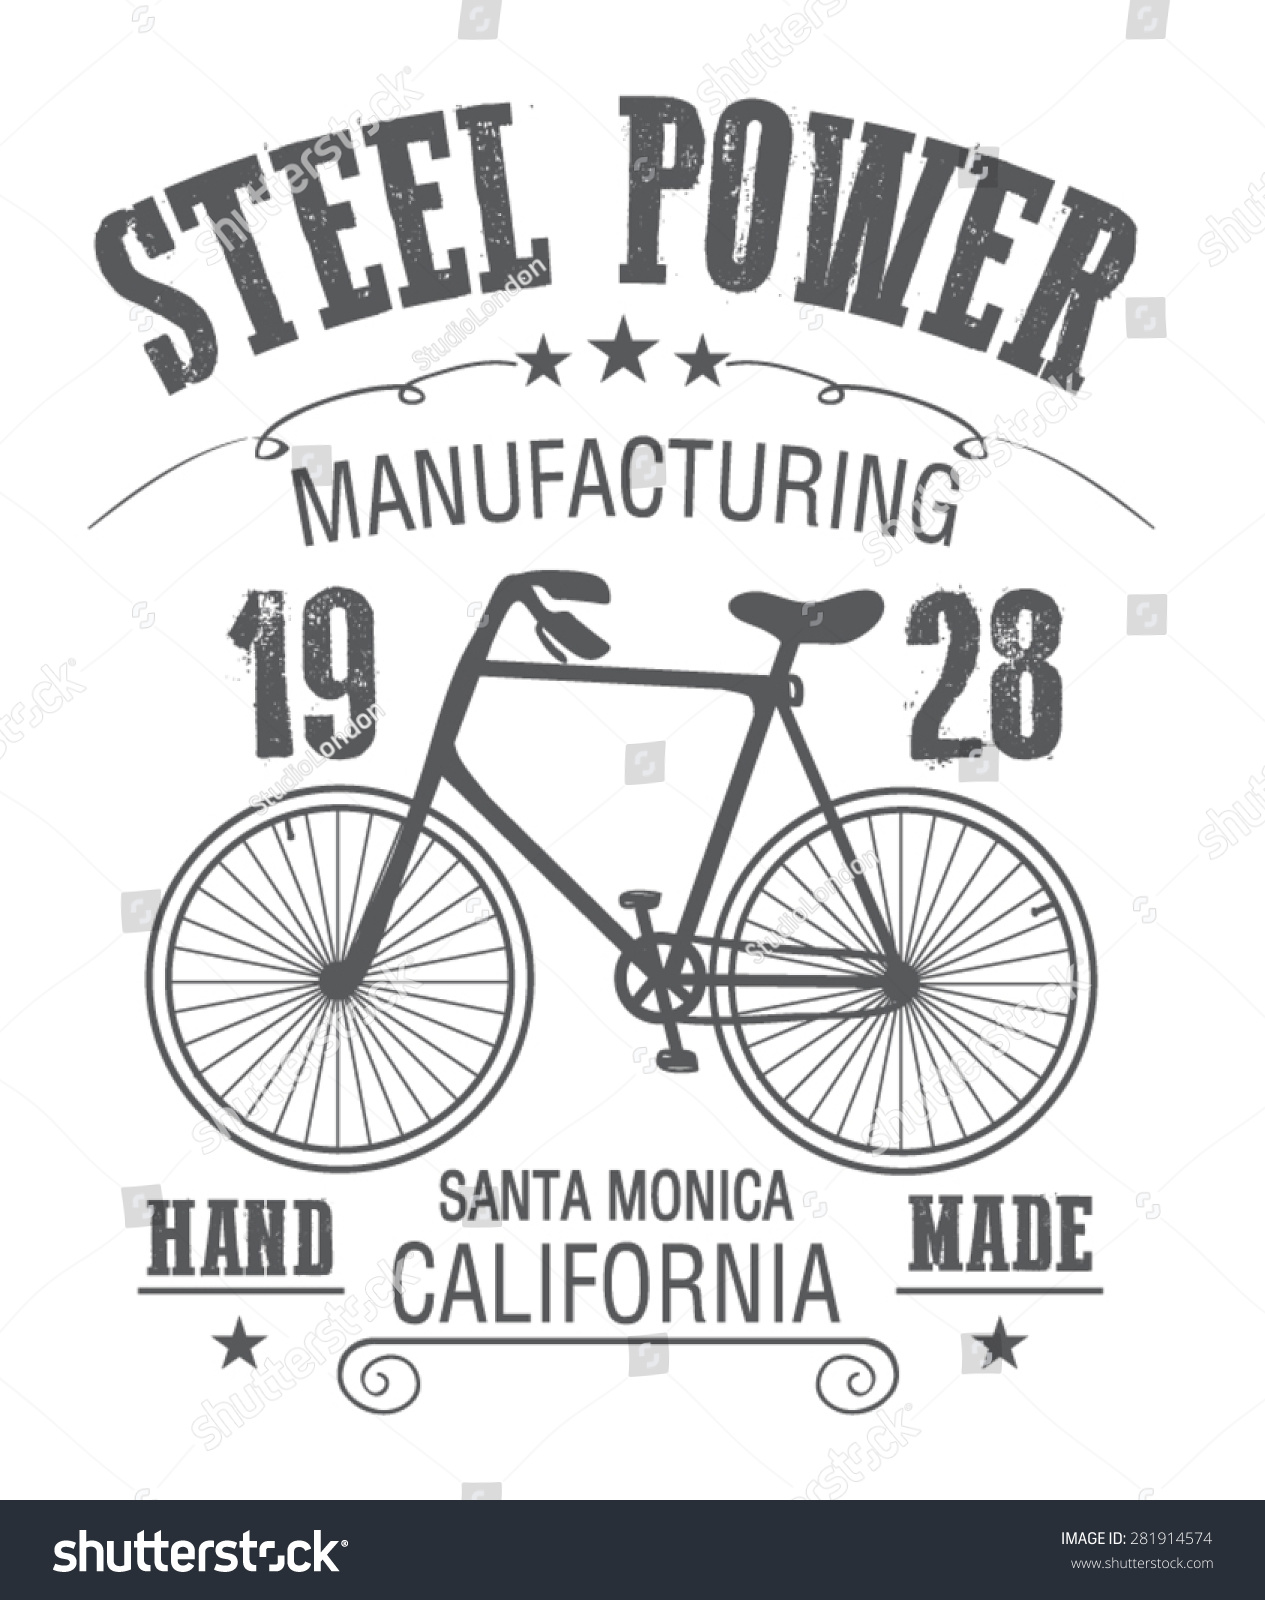 Shirt design illustrator template - Bicycle Illustration T Shirt Graphic Retro T Shirt Printing Label Bicycle Template